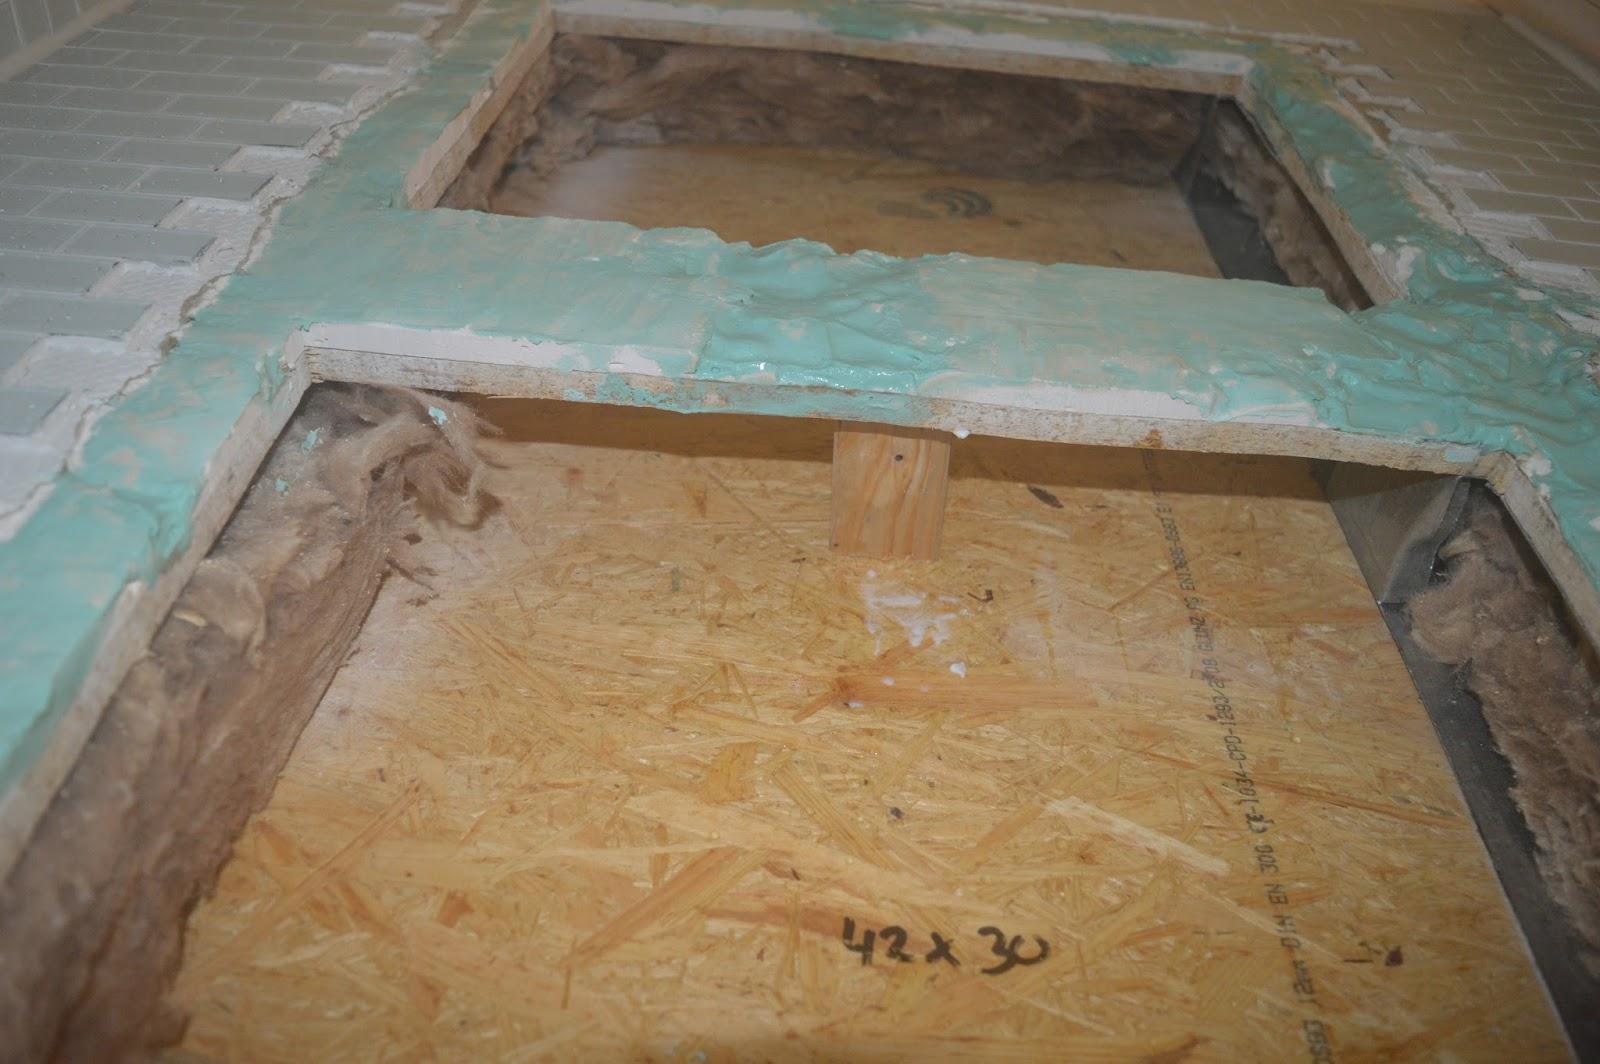 Fußboden Osb Zoro ~ Osb platten stärke für fußboden fußboden mit osb platten osb